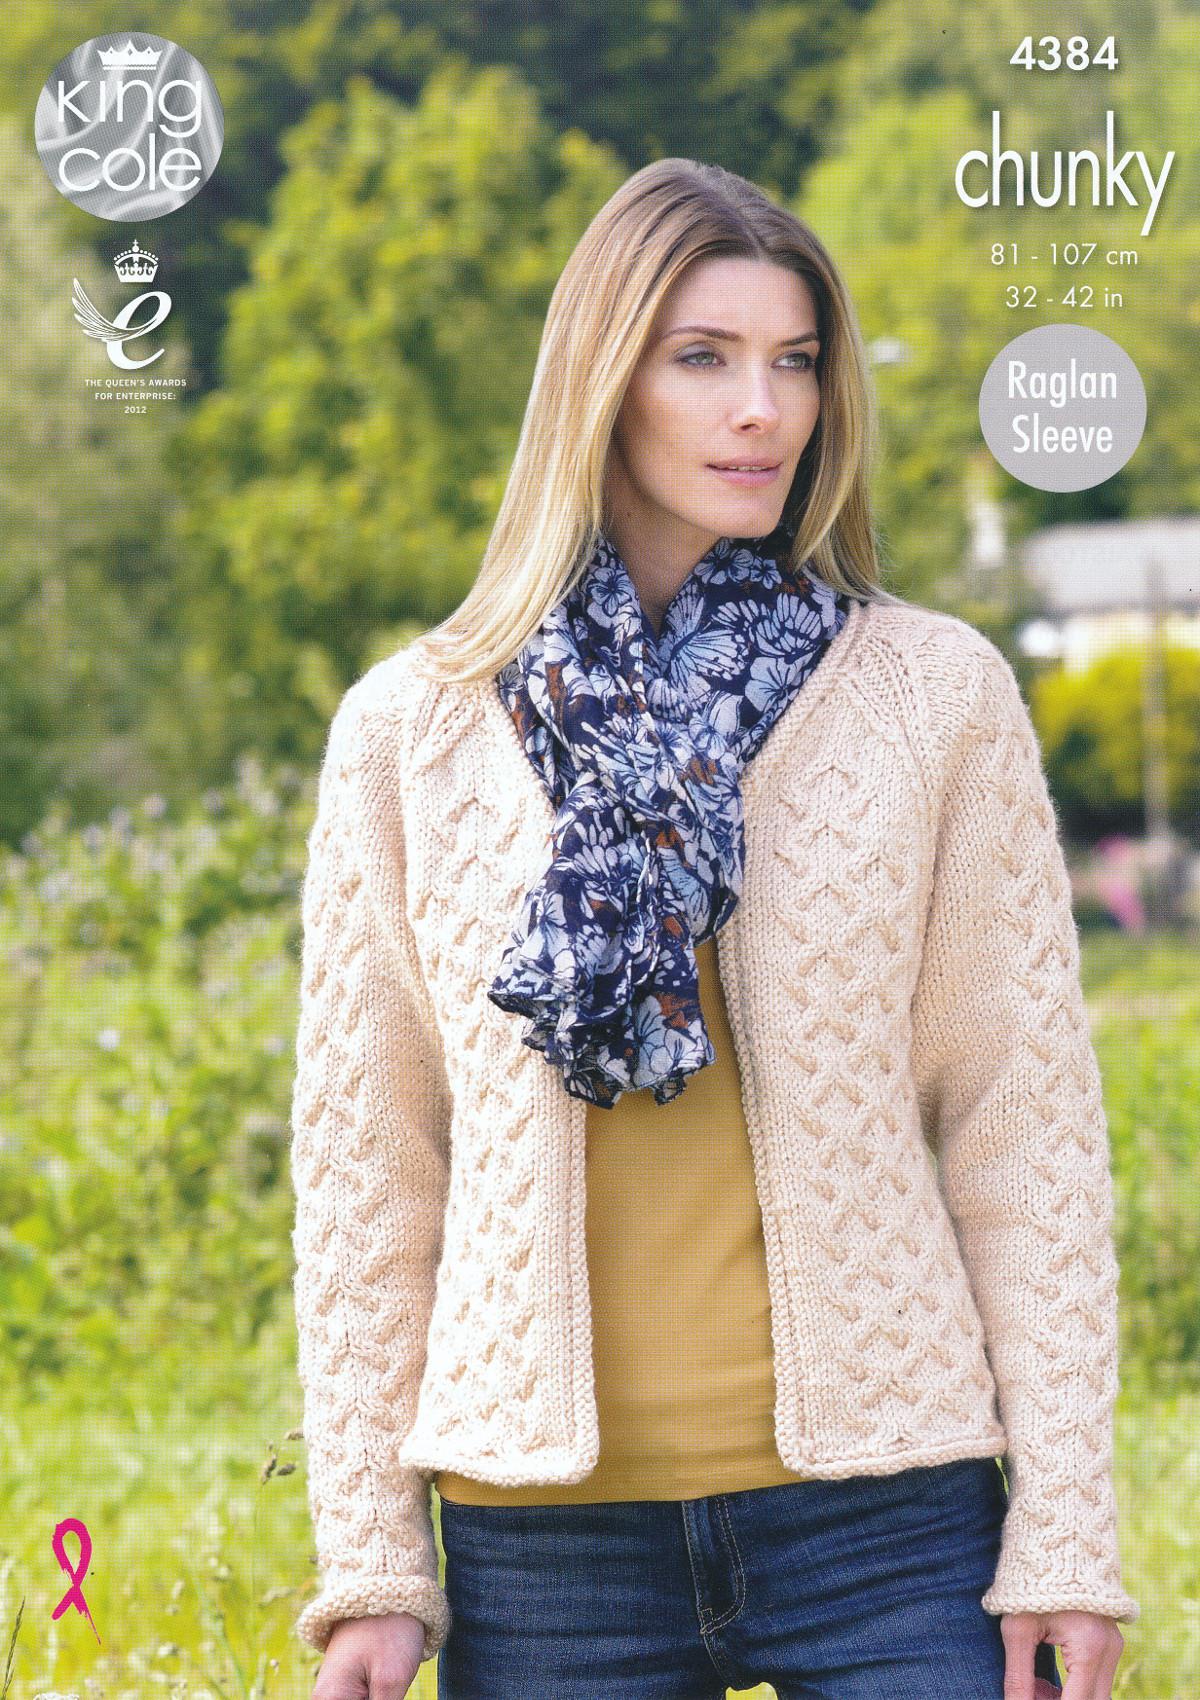 King Cole Ladies Chunky Knitting Pattern Raglan Sleeve Waistcoat ...